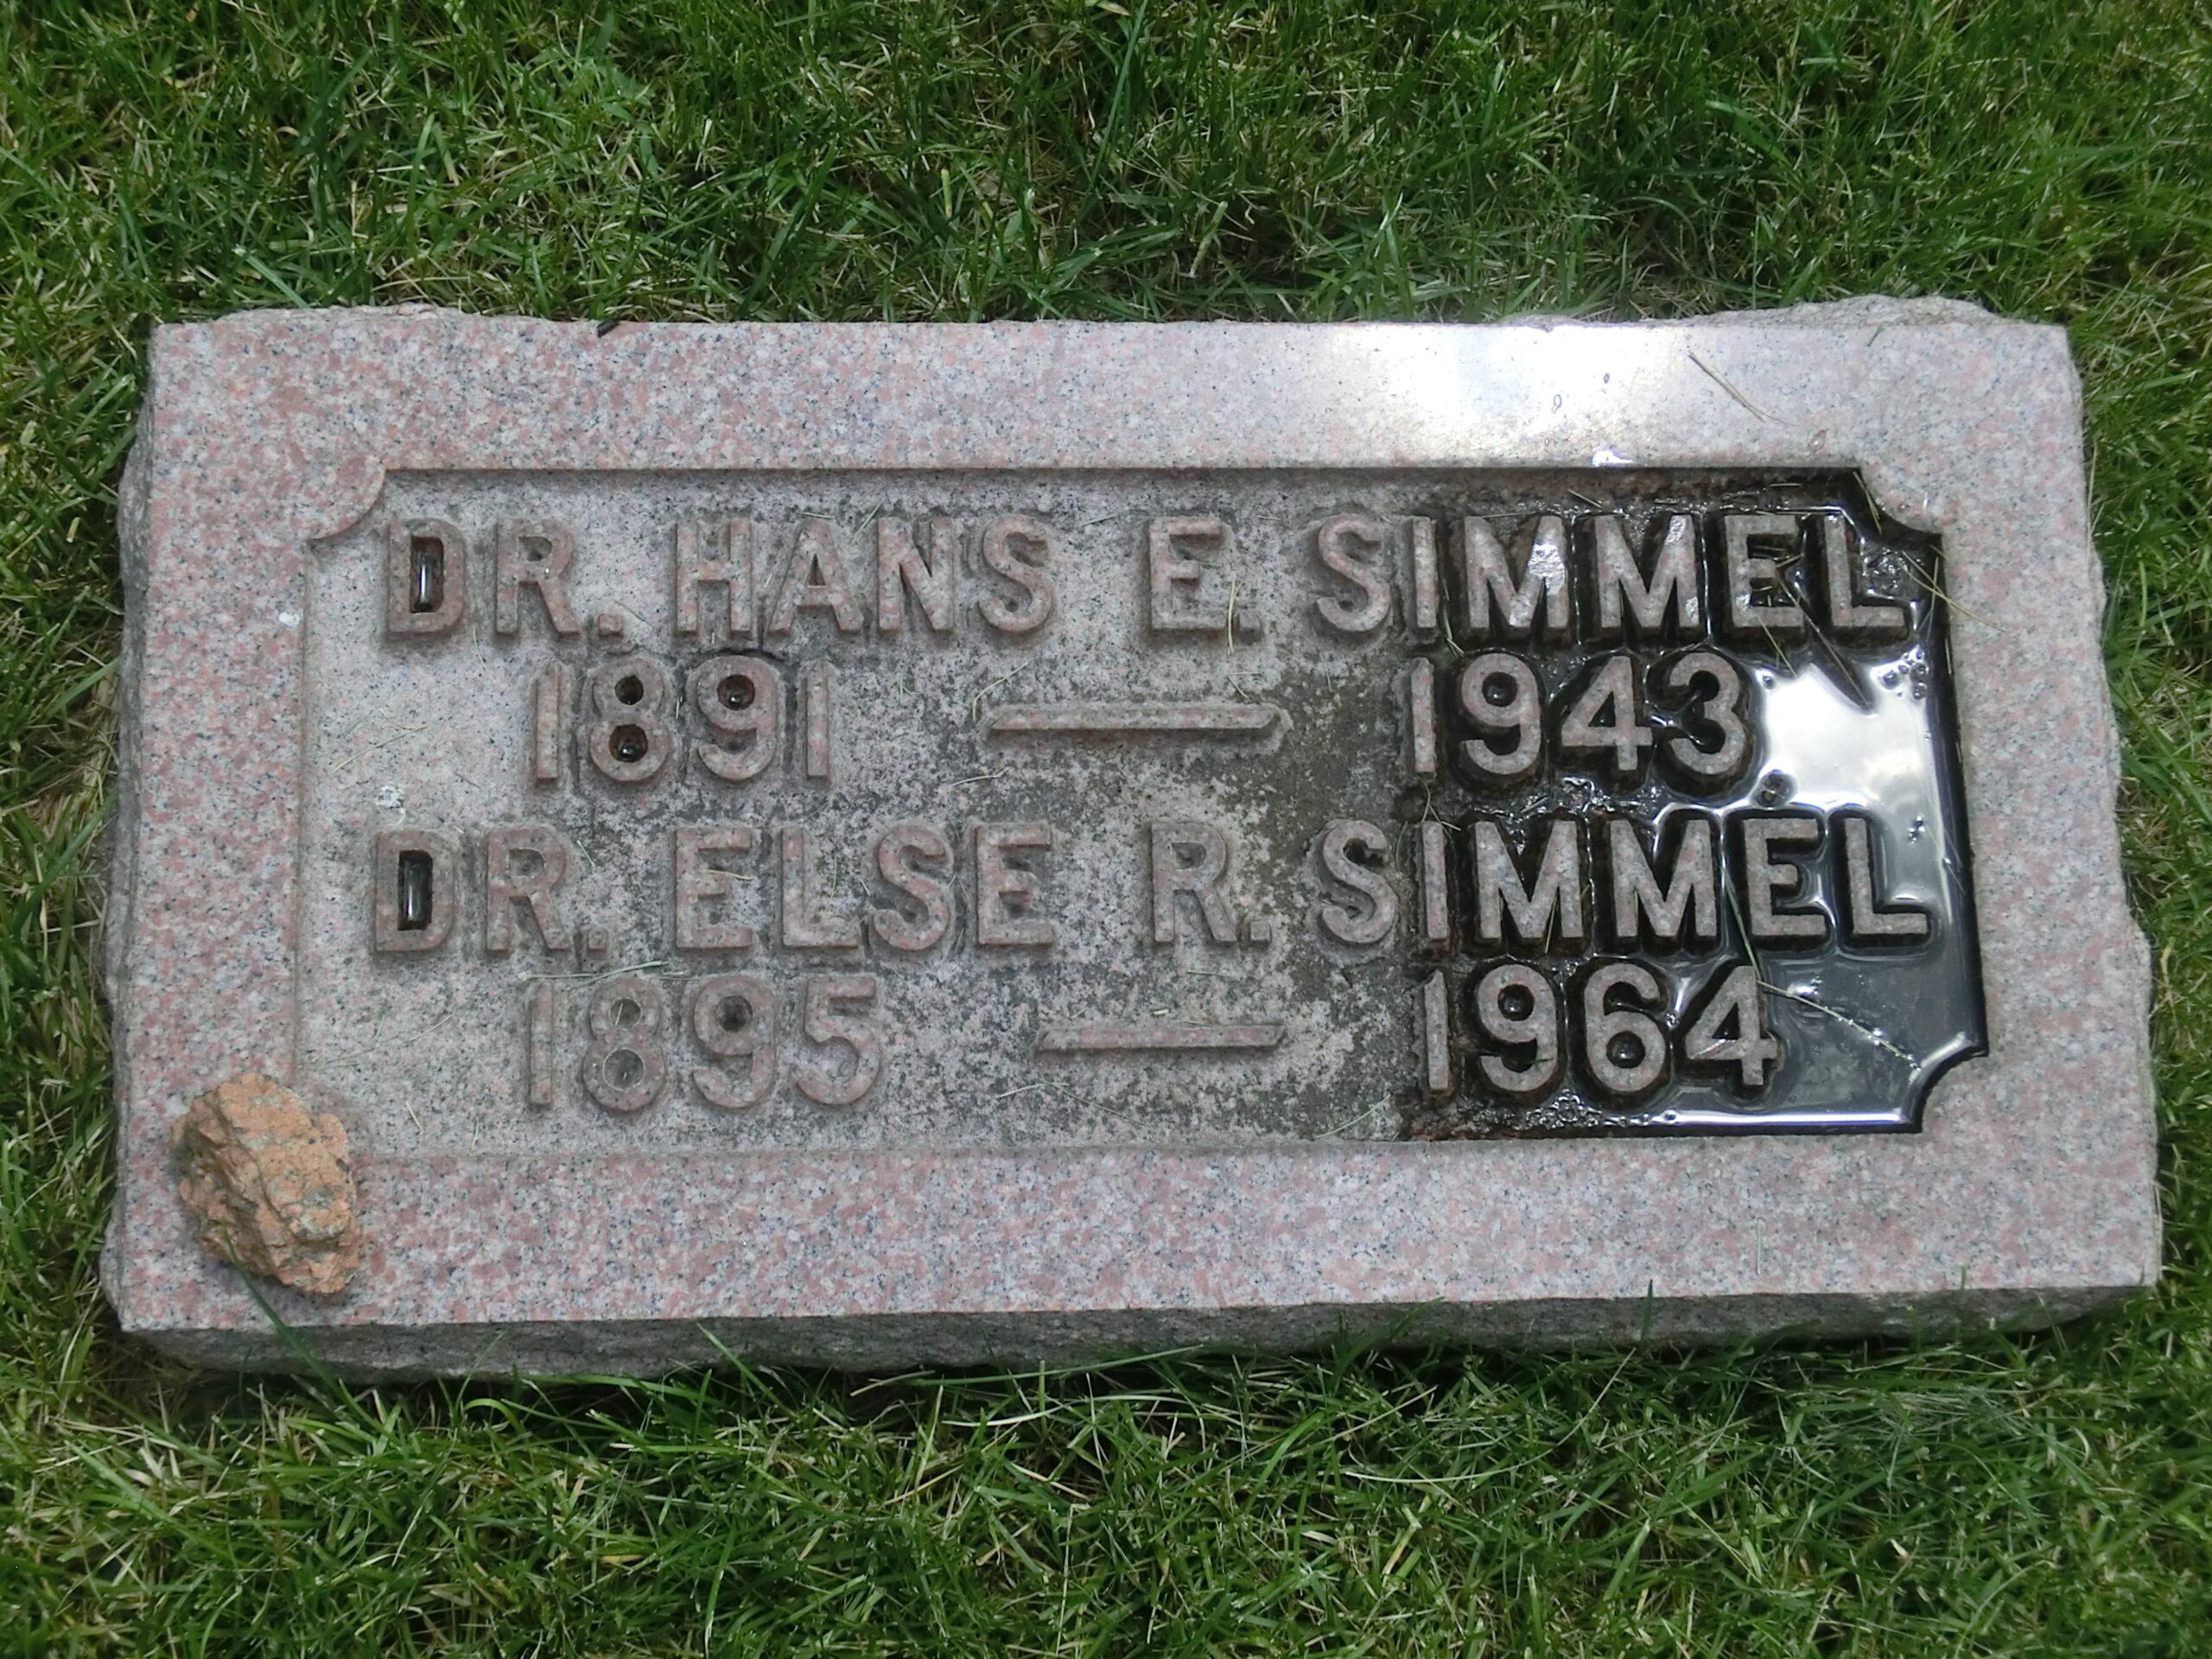 Grabstätte Hans und Else Simmel, Colorado Springs © Cornelia Fris, Seelsorgerin SRH Wald-Klinikum Gera